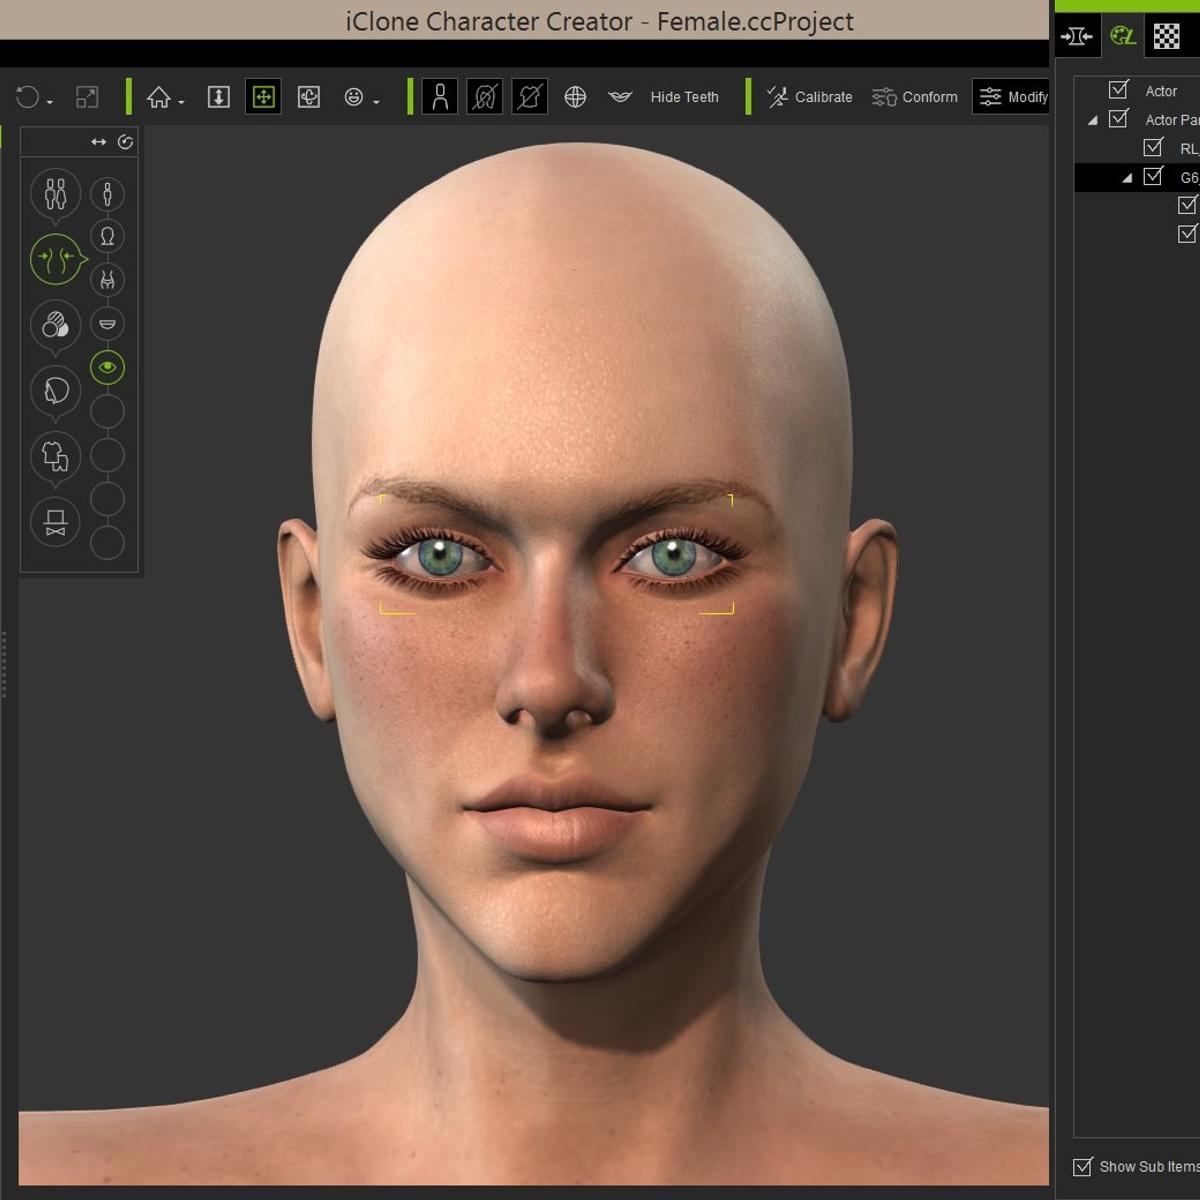 iClone Character Creator Alternatives and Similar Software